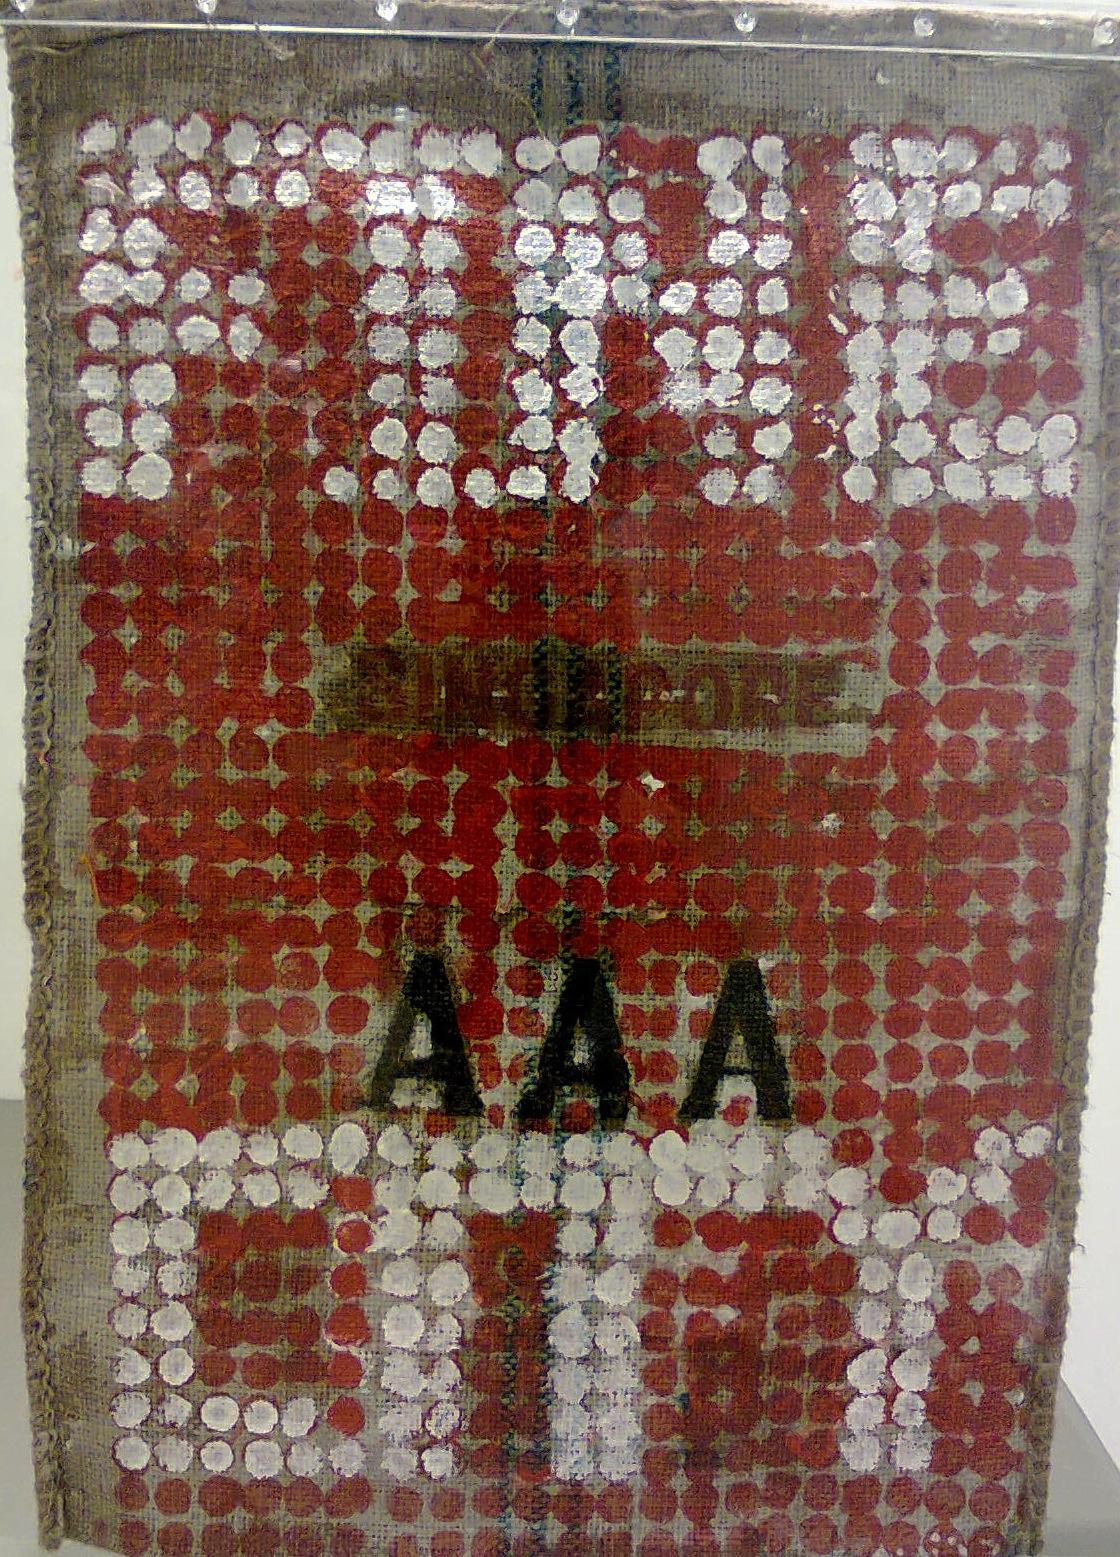 Anthony CHUA   Fine City  2012 Acrylic on rice sack 99 x 83 cm